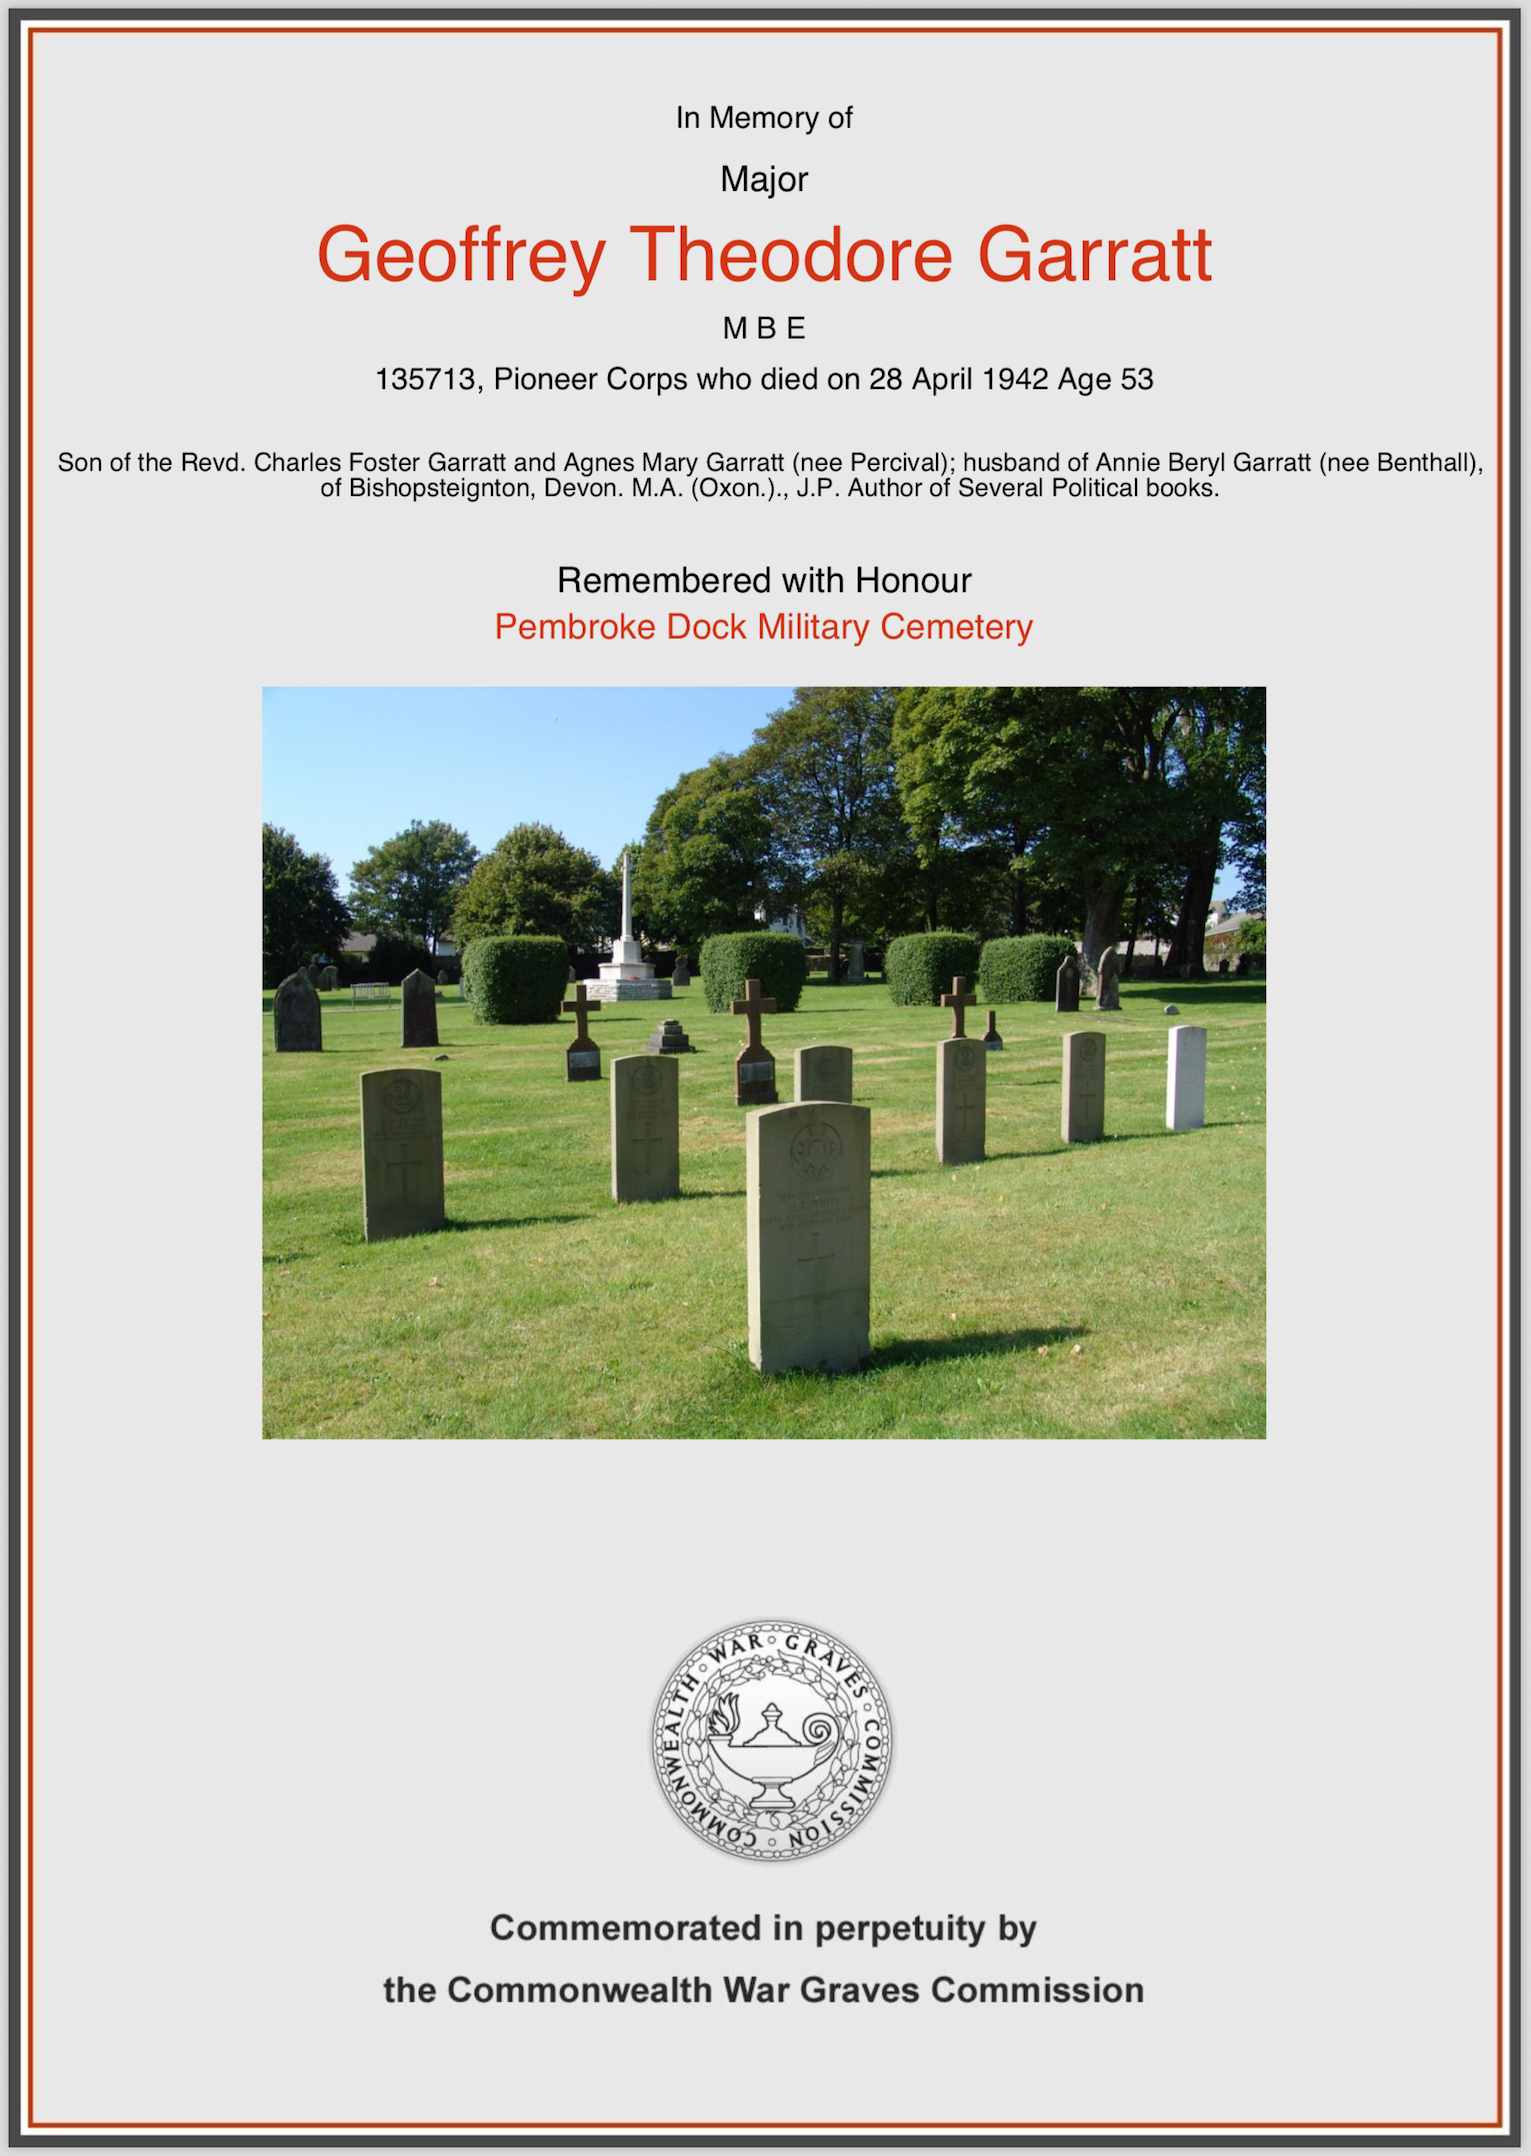 G.T. Garratt Memorial